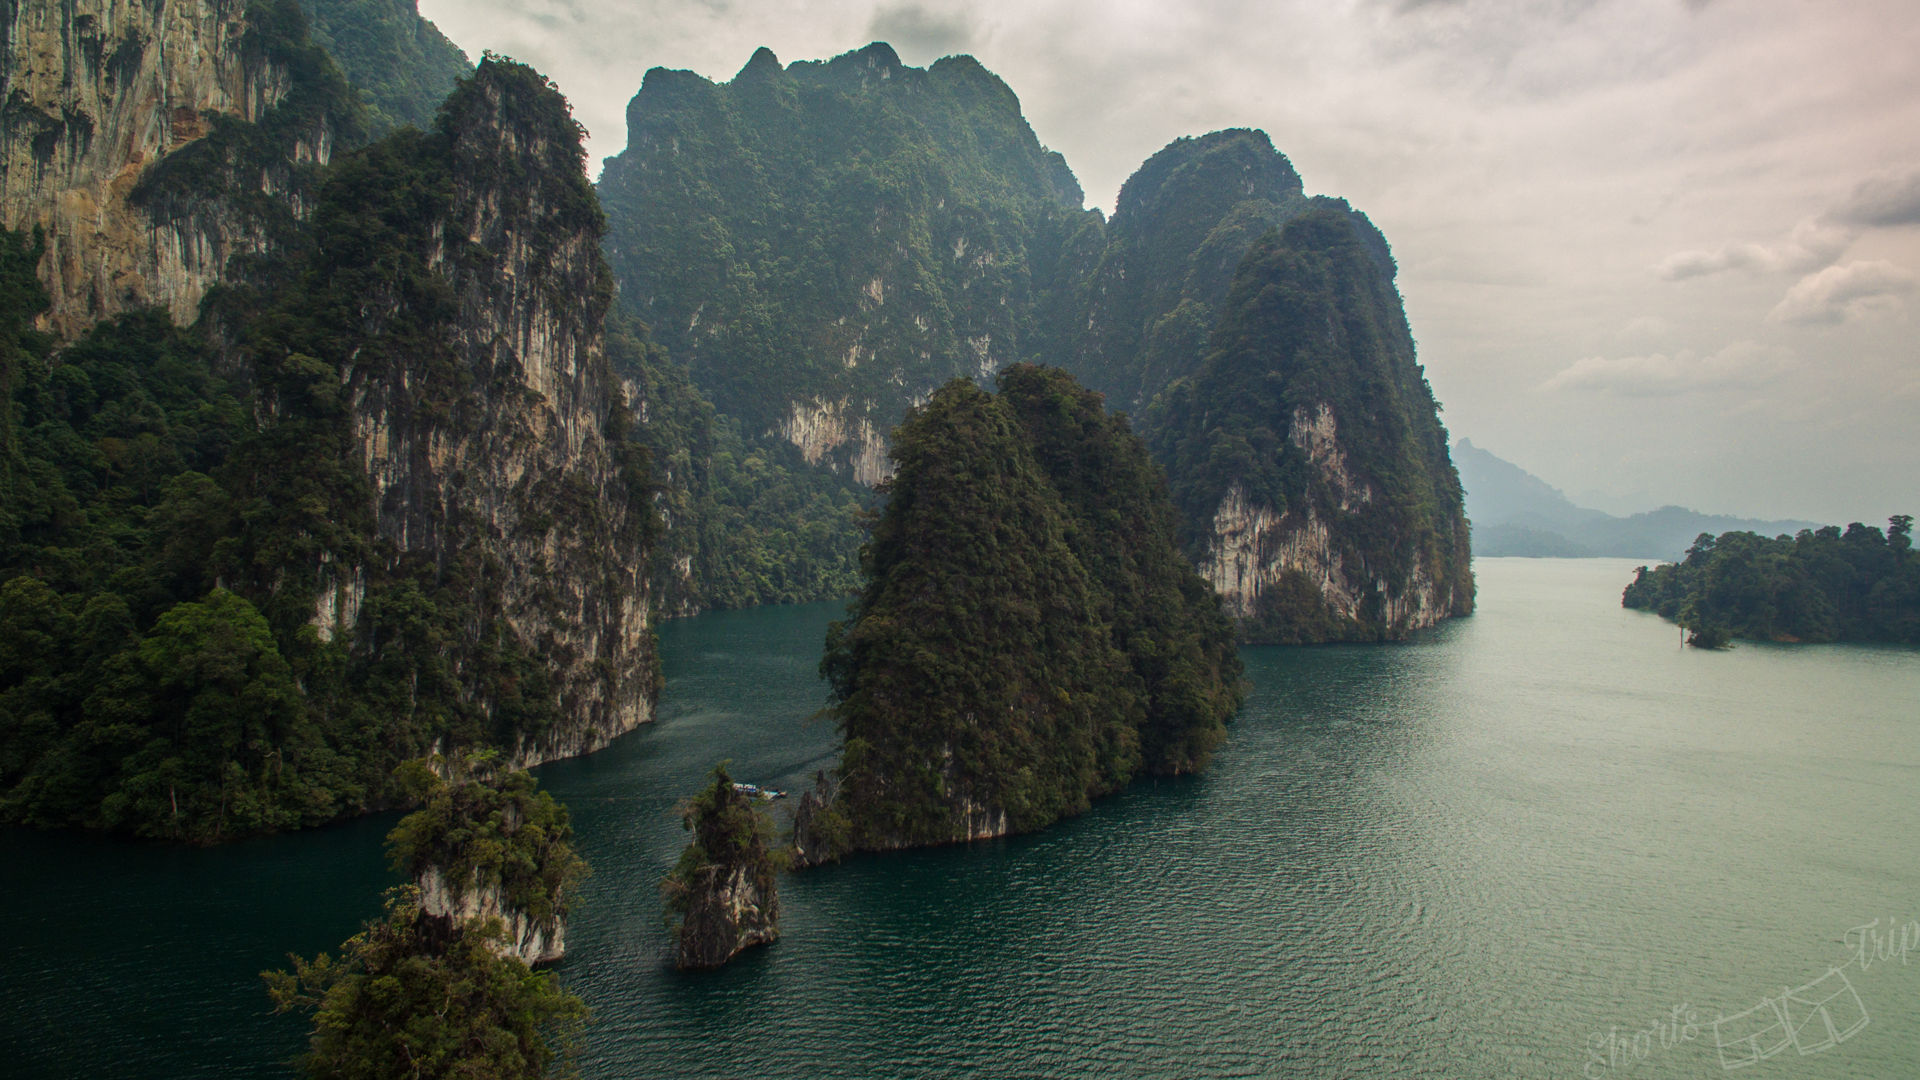 Guilin khao sok, guilin, guilin cheow lan lake, guilin chiew lan lake